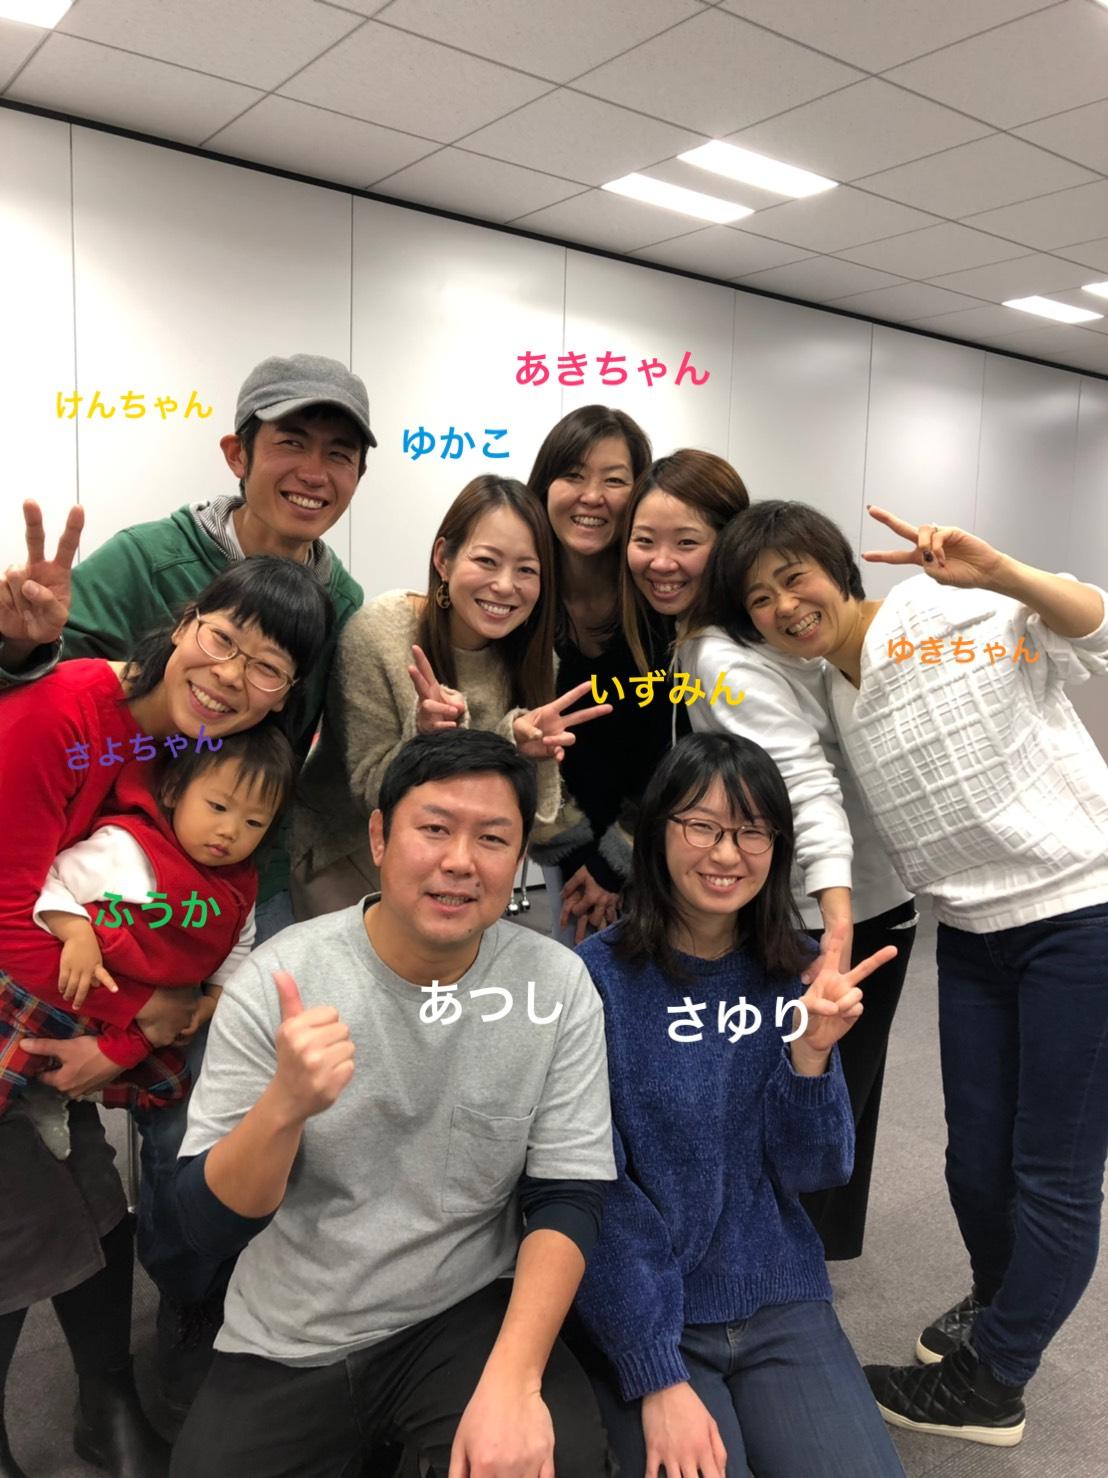 2019/1/29 1010HAPPY藤沢Aグループ 感想